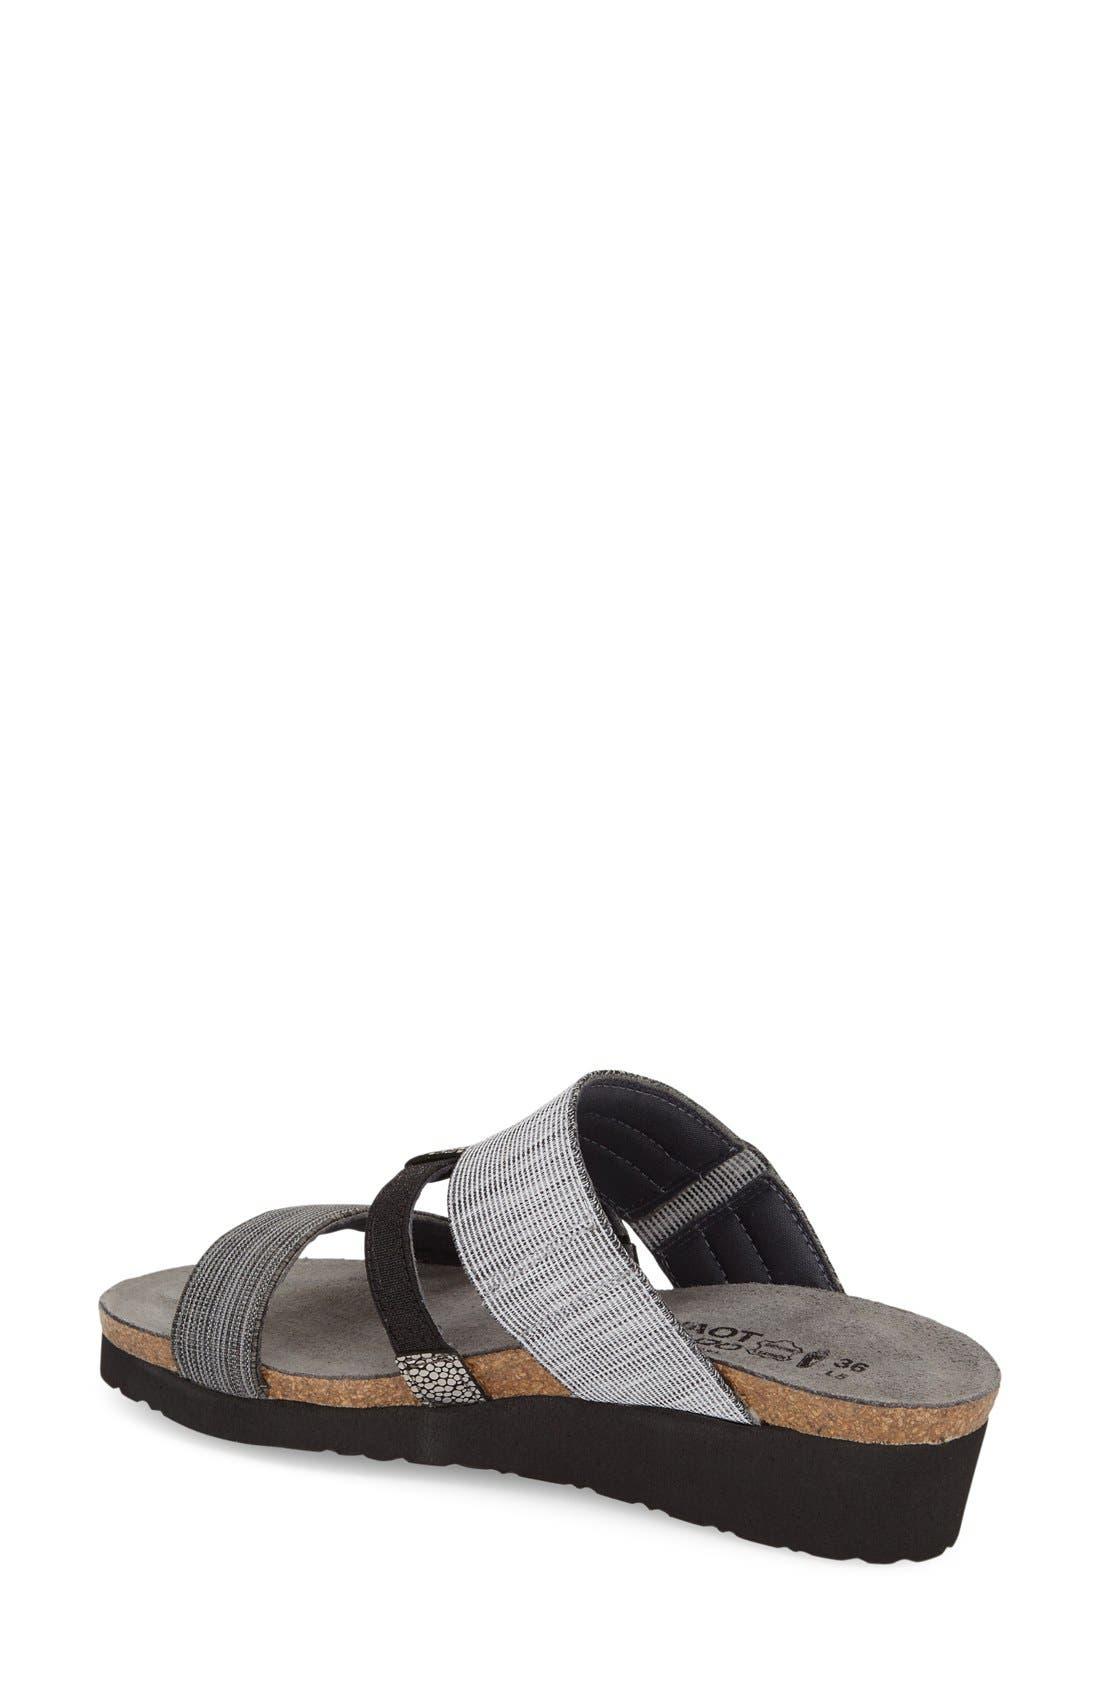 'Brenda' Slip-On Sandal,                             Alternate thumbnail 2, color,                             Grey/ Black Leather Fabric